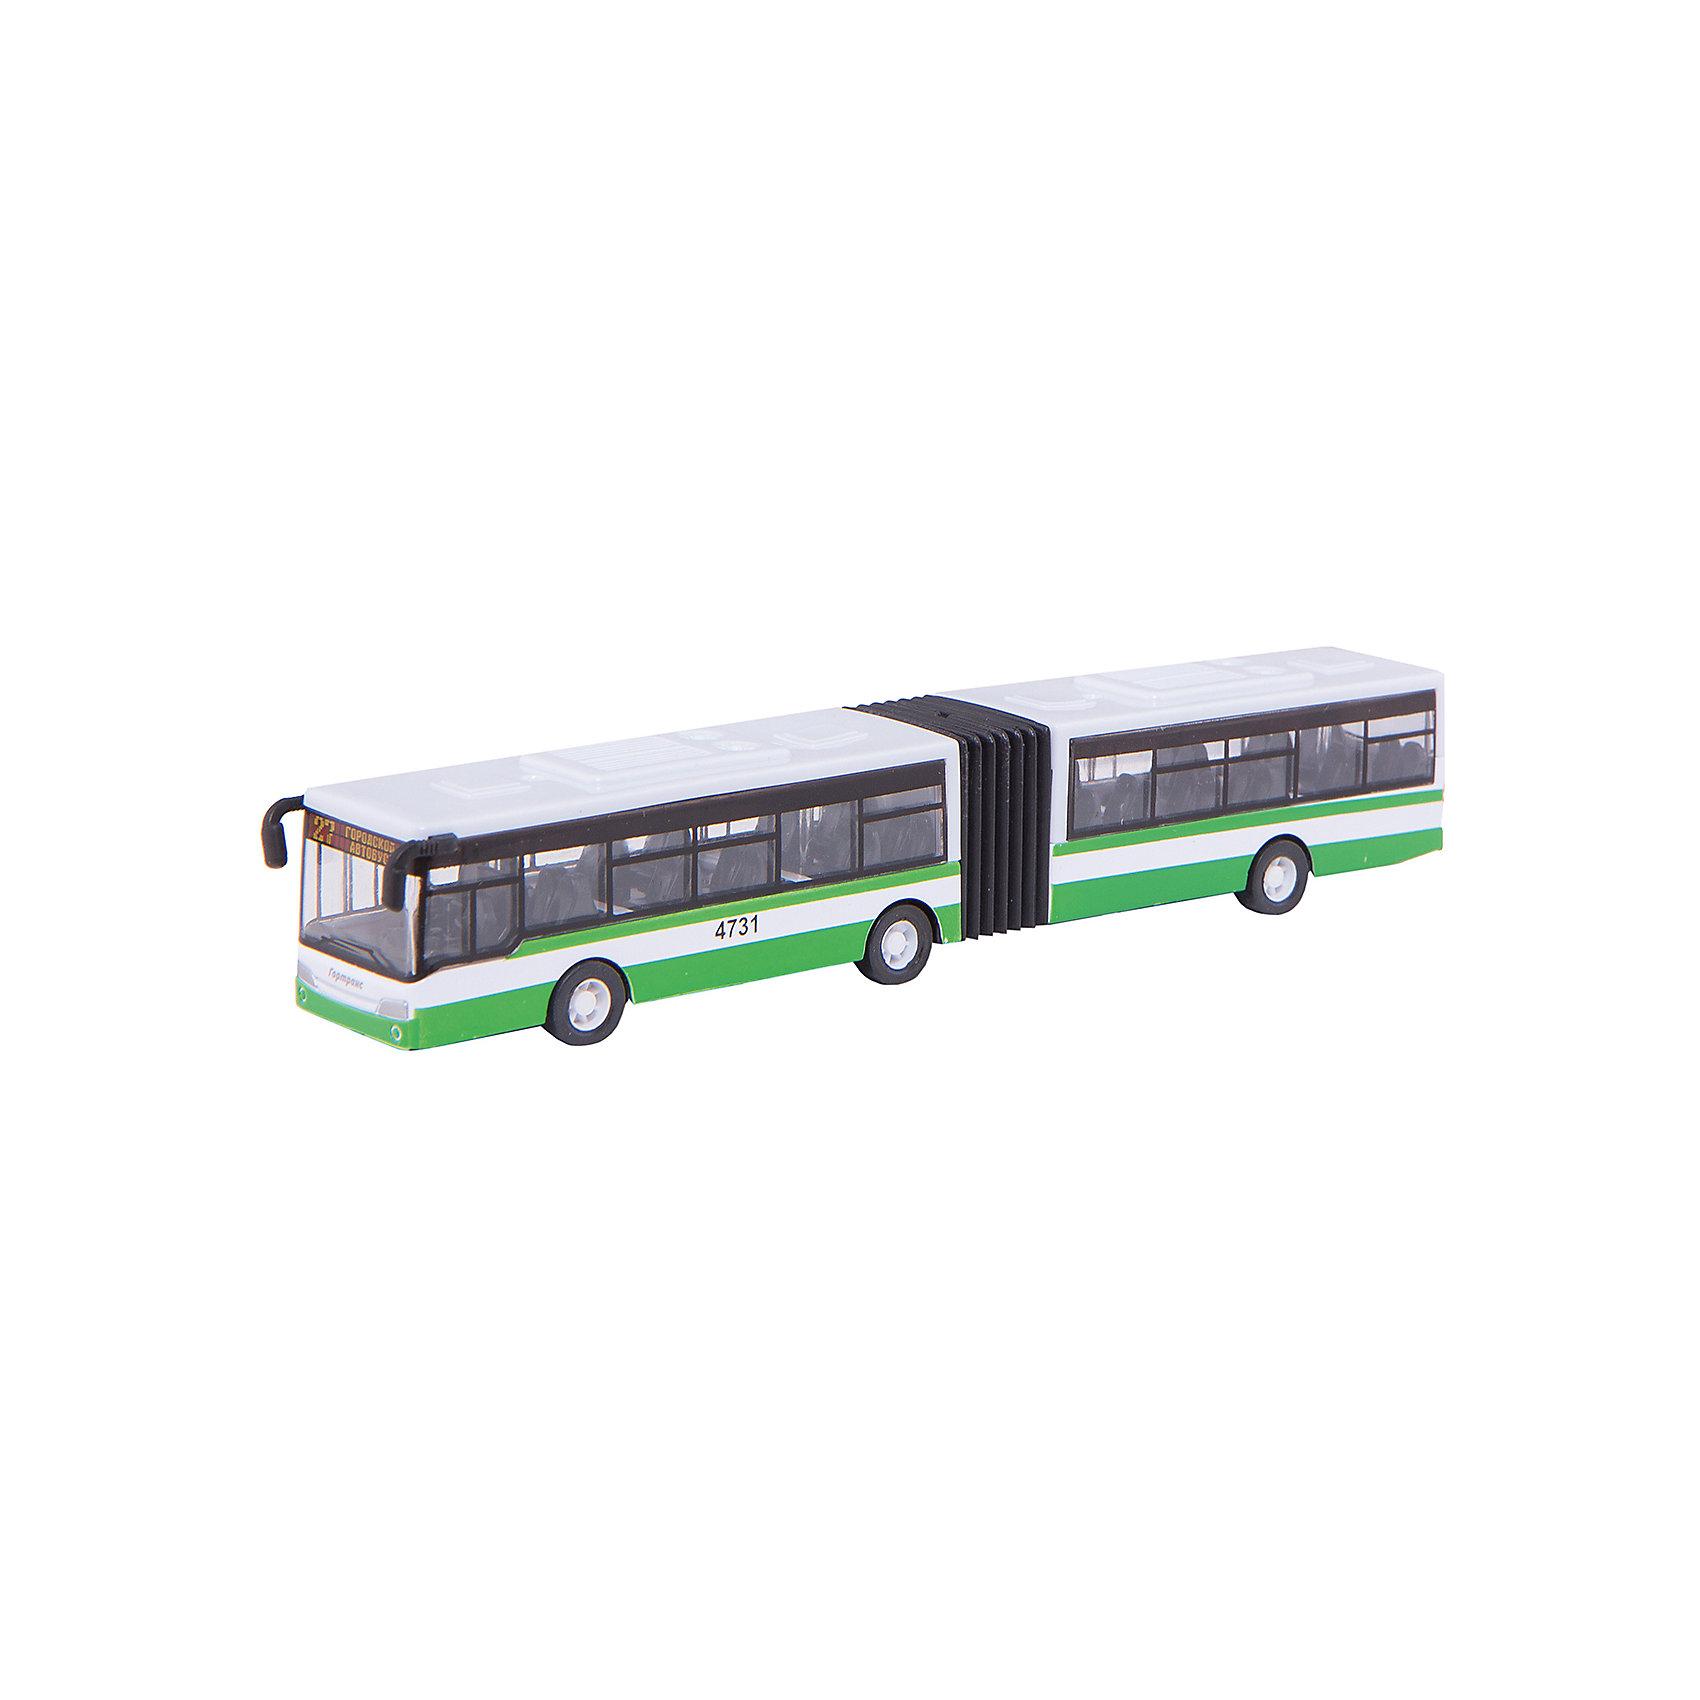 Автобус с гармошкой, Технопарк